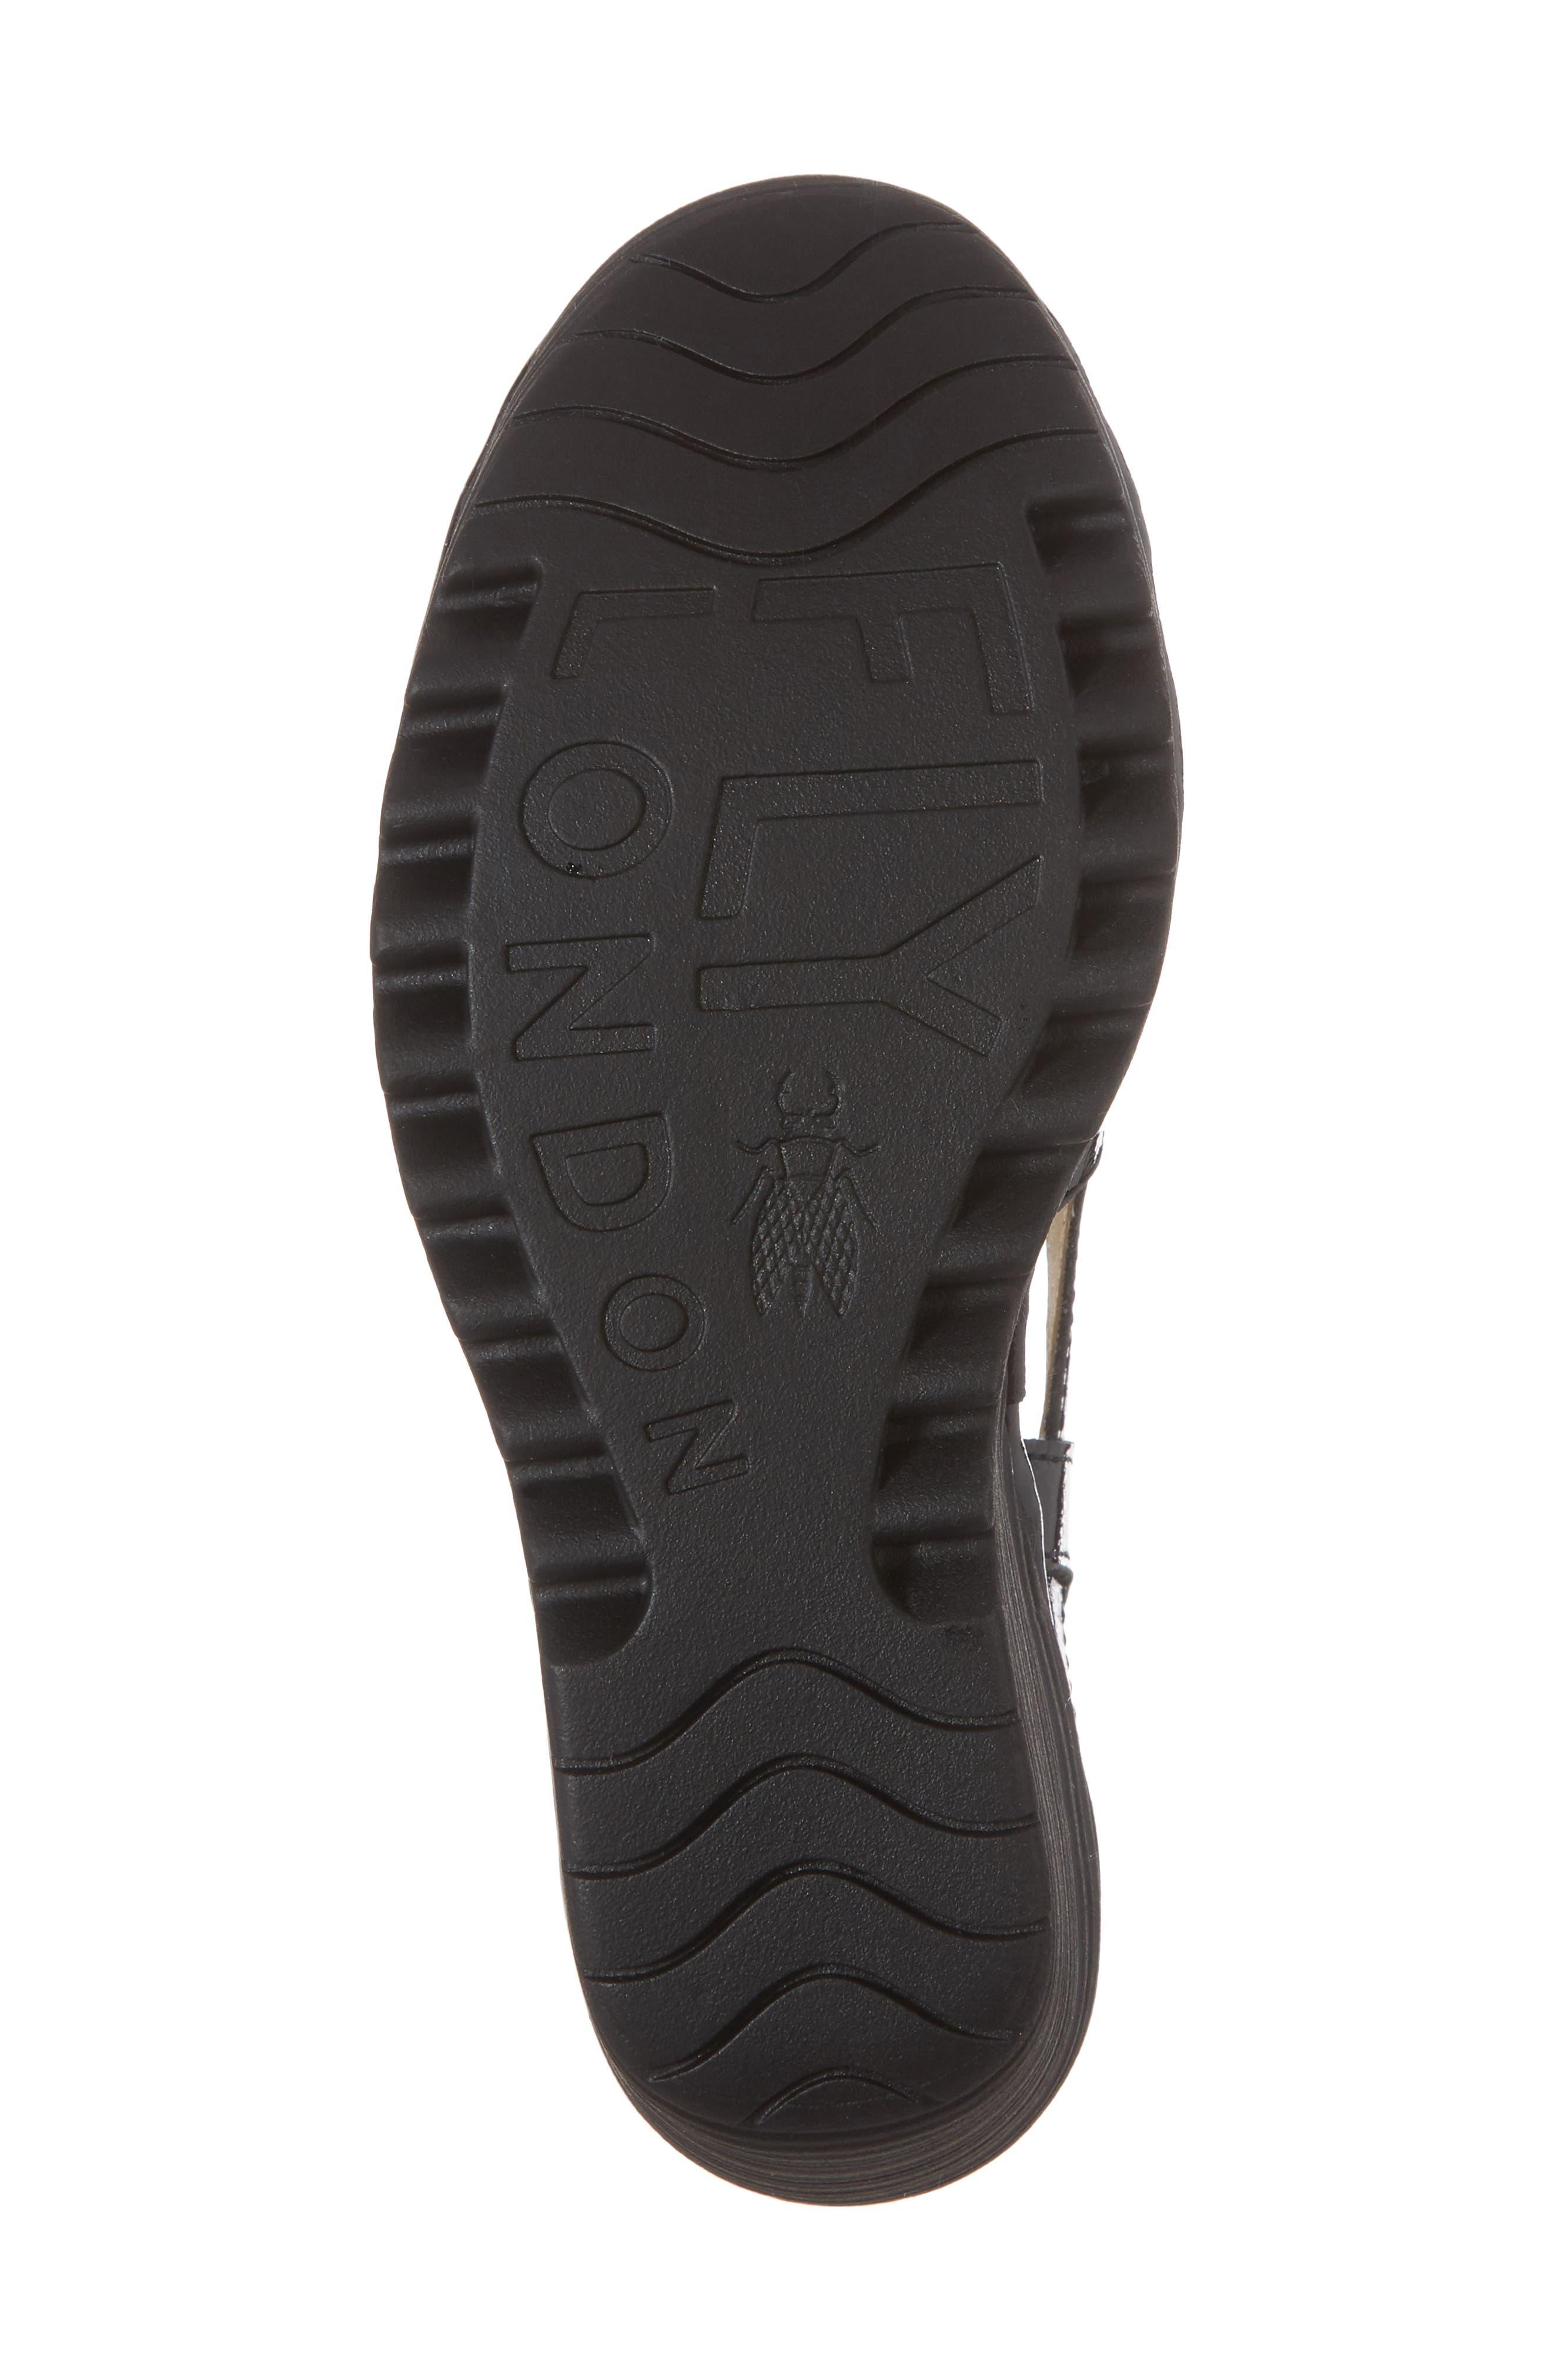 Yadi Wedge Sandal,                             Alternate thumbnail 6, color,                             BLACK LUXOR LEATHER